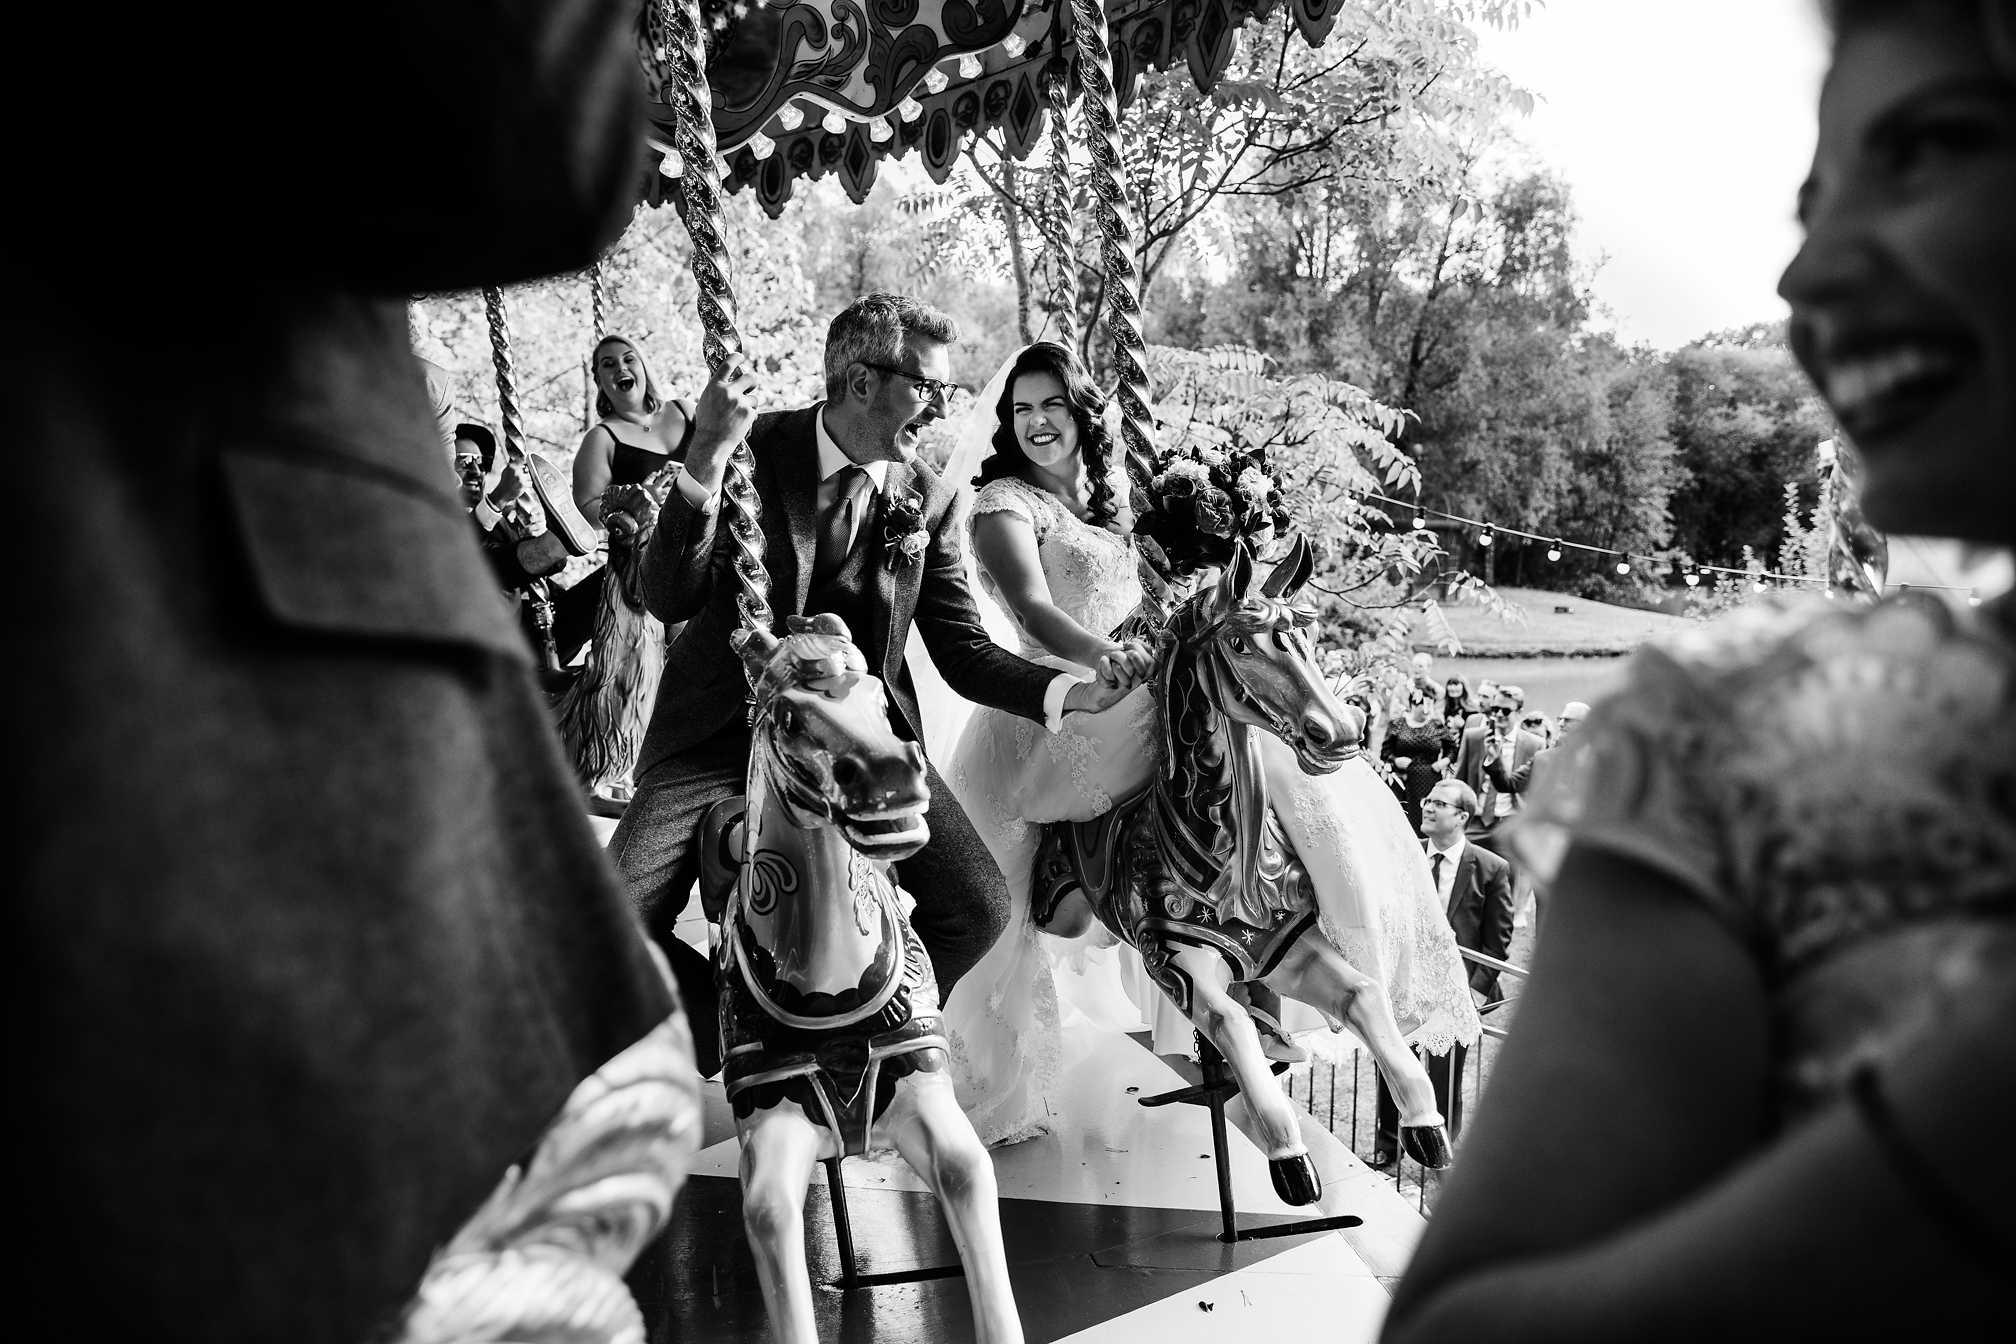 Bride and Groom on a Fairground Carousel